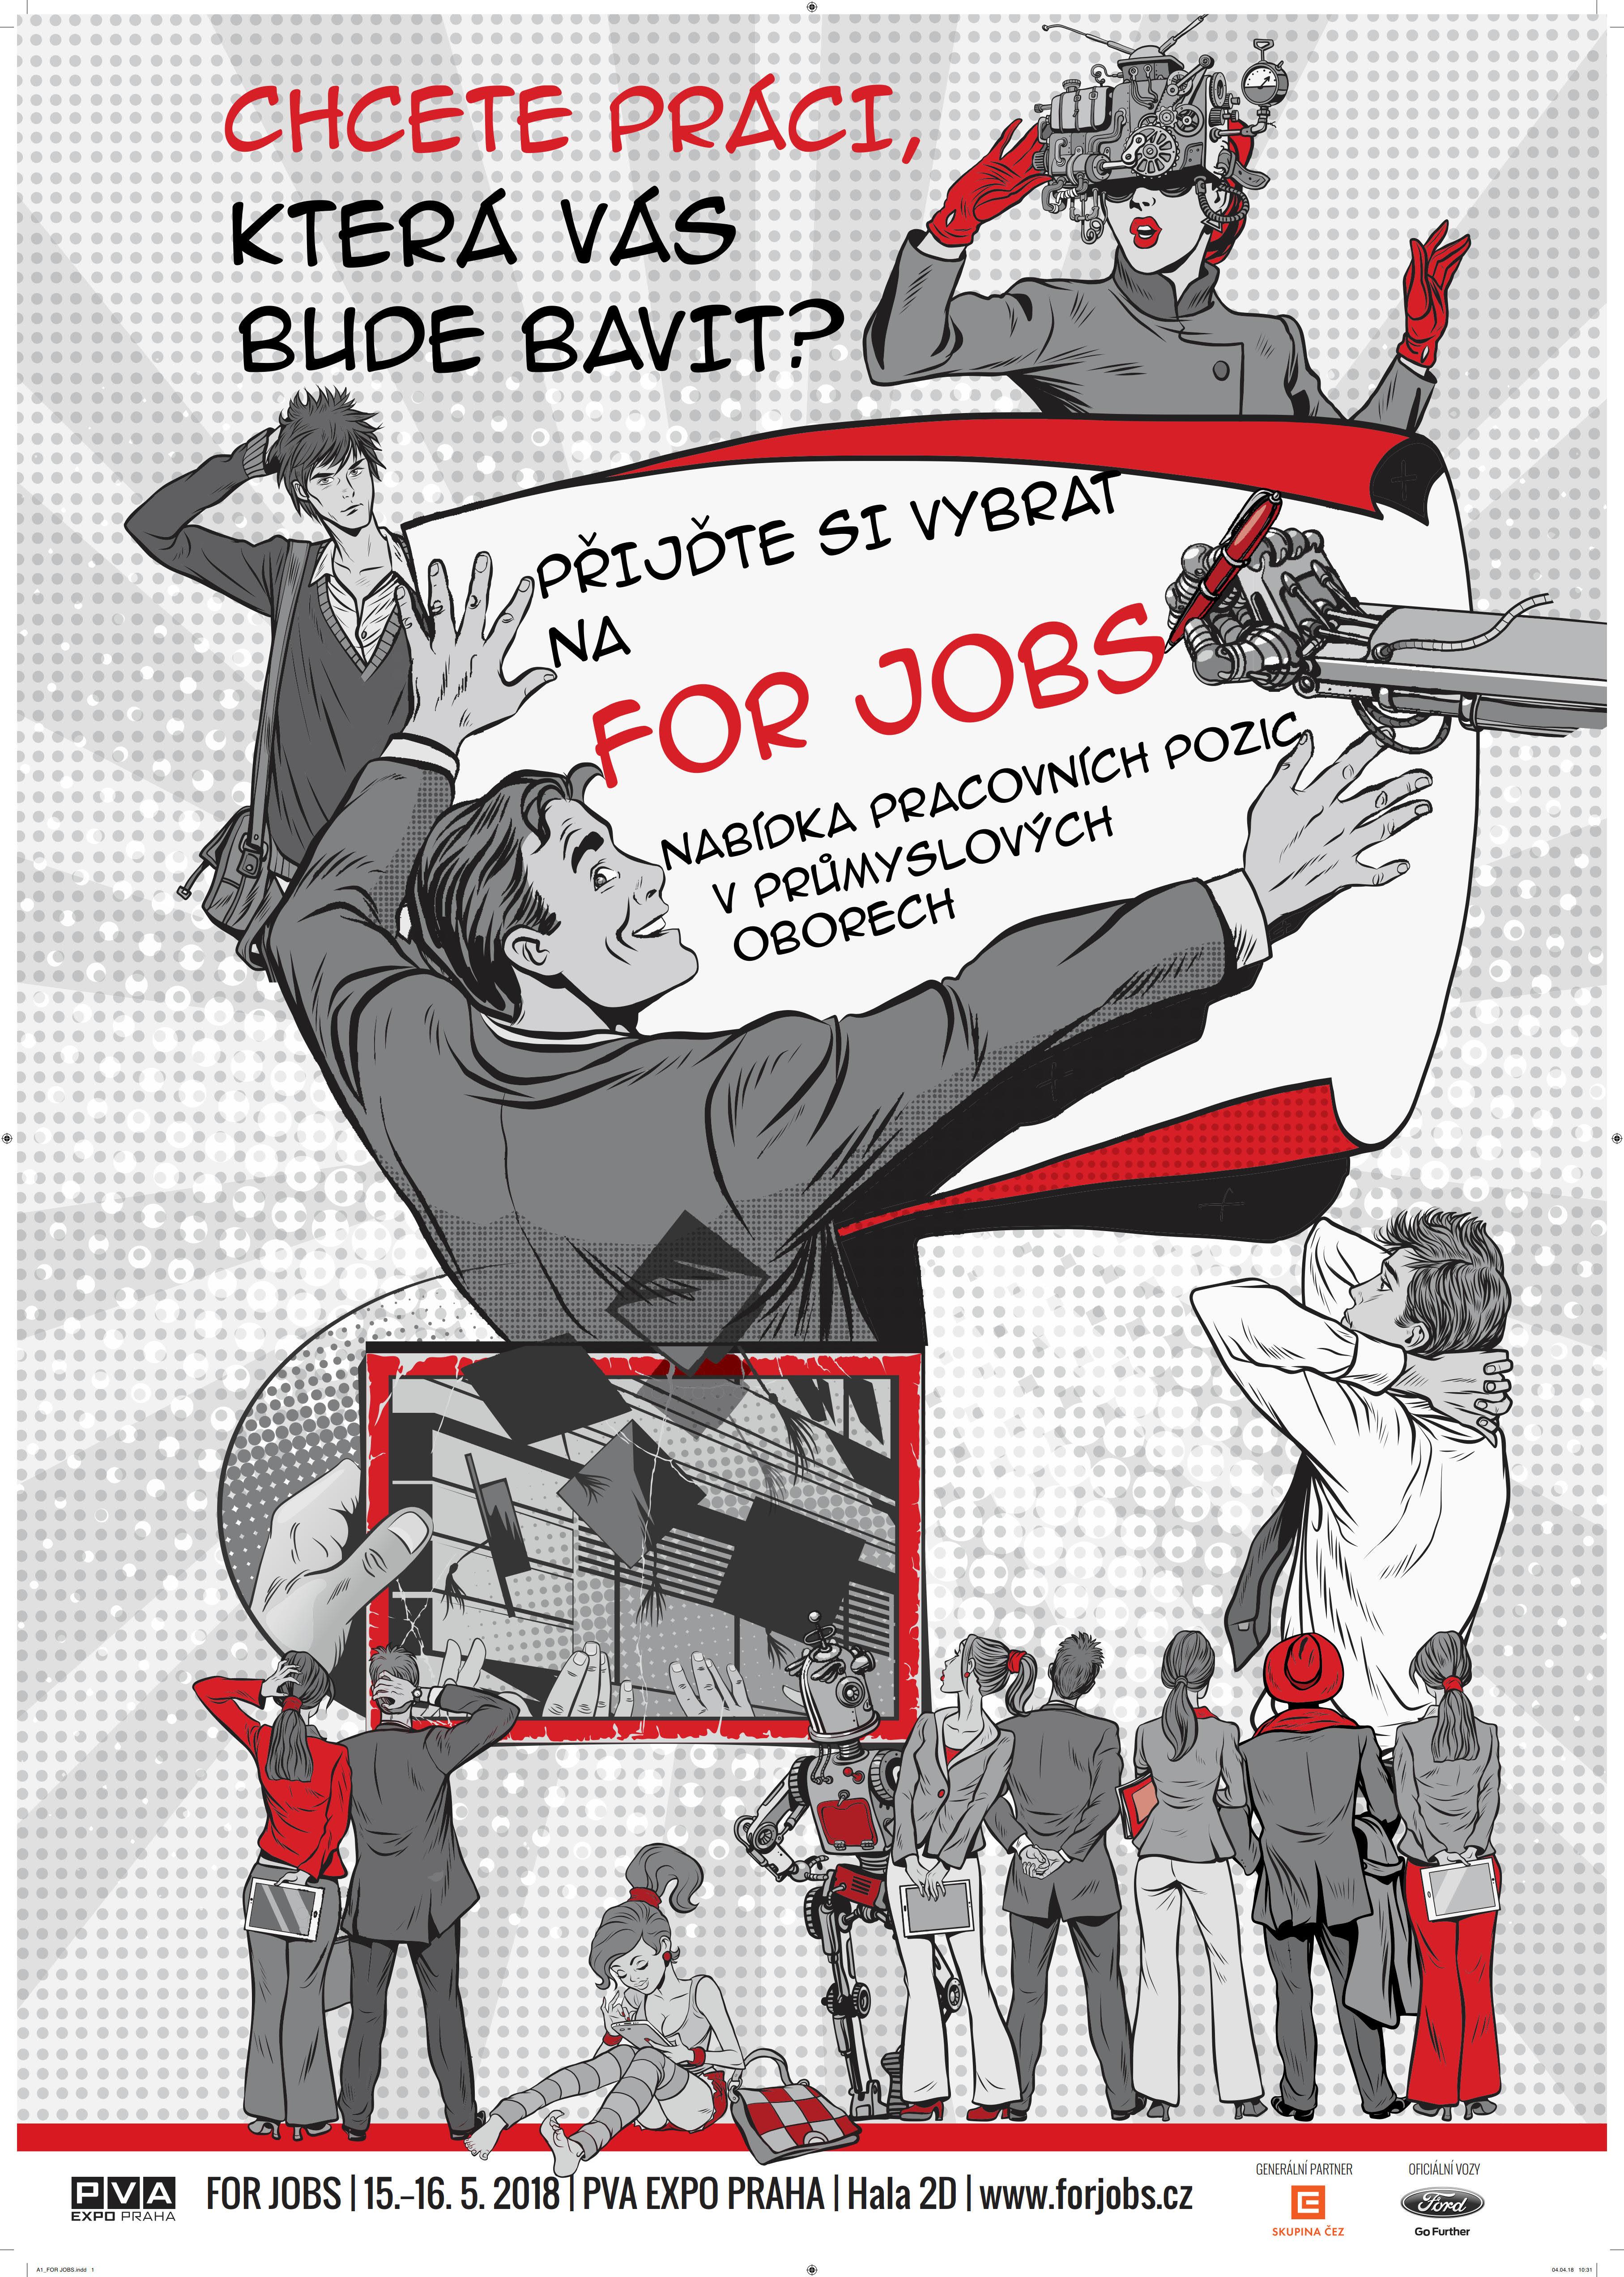 For Jobs Praha